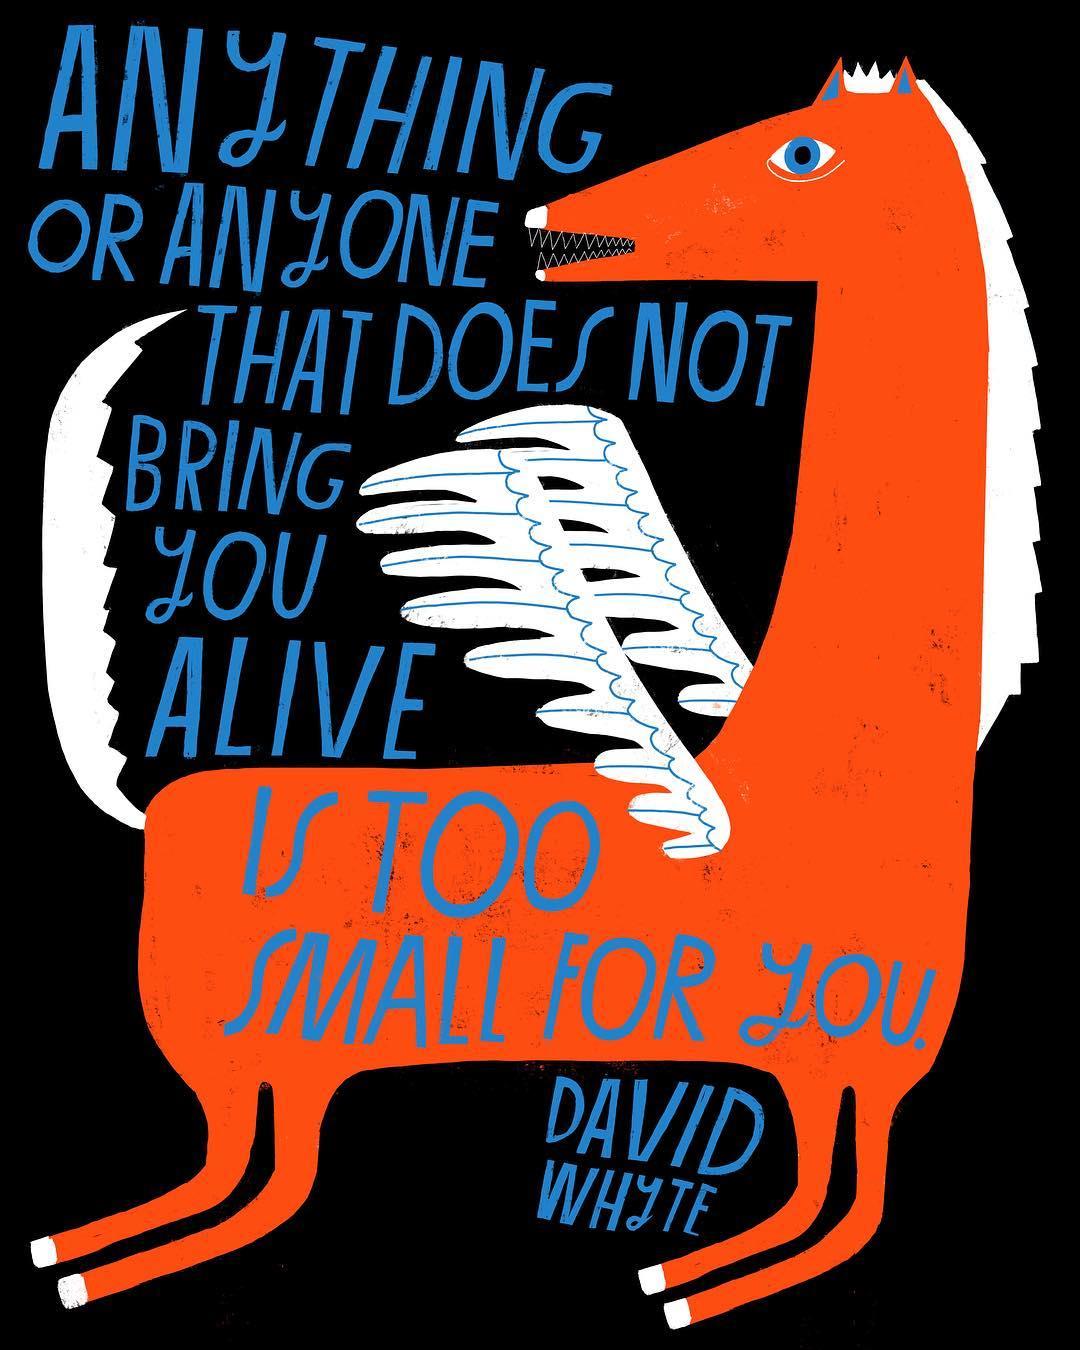 Hand lettering illustration by Lisa Congdon